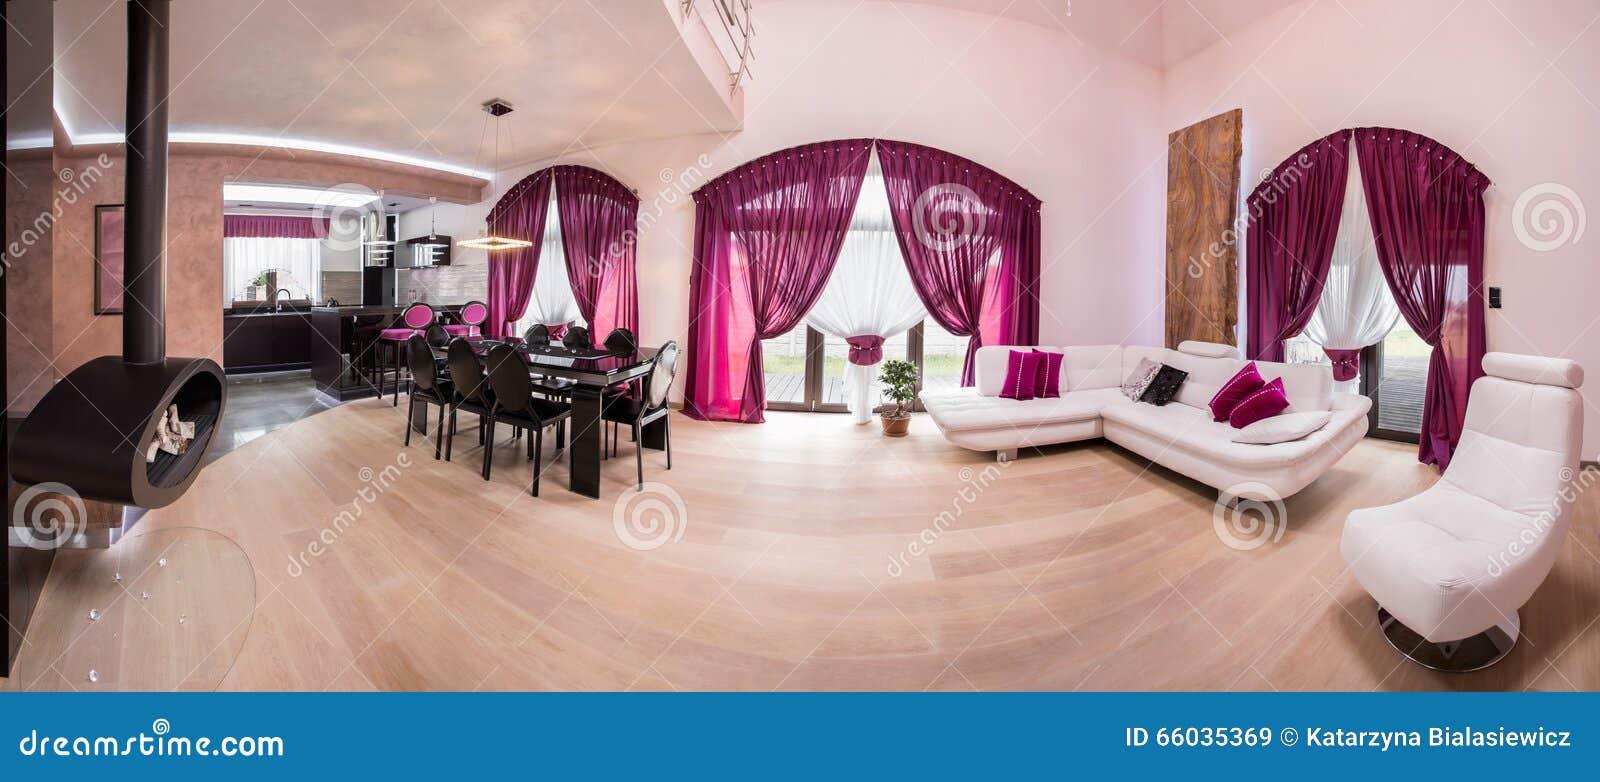 Cucina, Sala Da Pranzo E Salotto Immagine Stock - Immagine di seduta ...